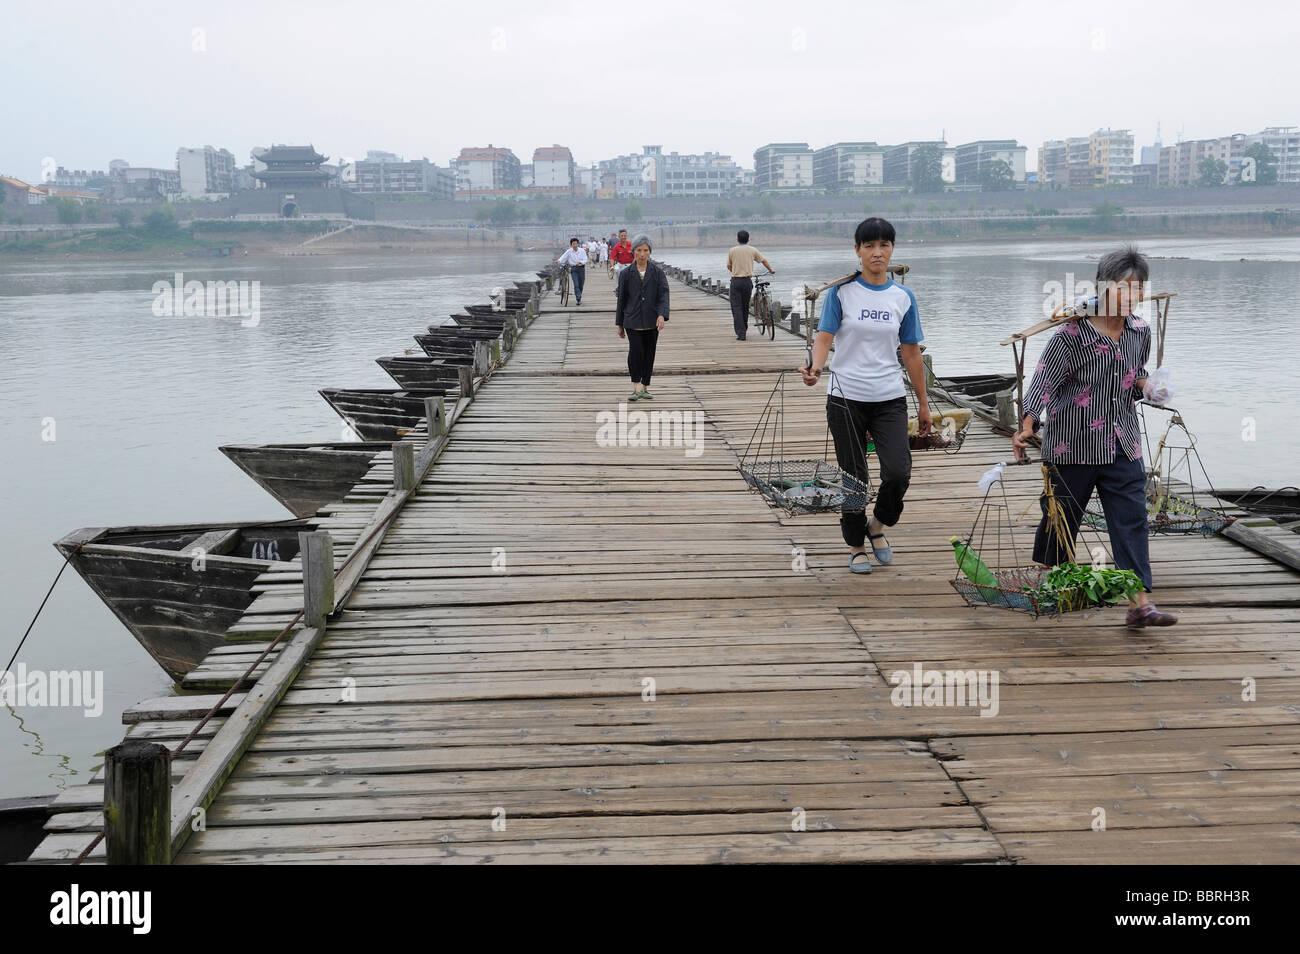 Ancient pontoon bridge in Ganzhou, Jiangxi, China. 11-Jun-2009 - Stock Image